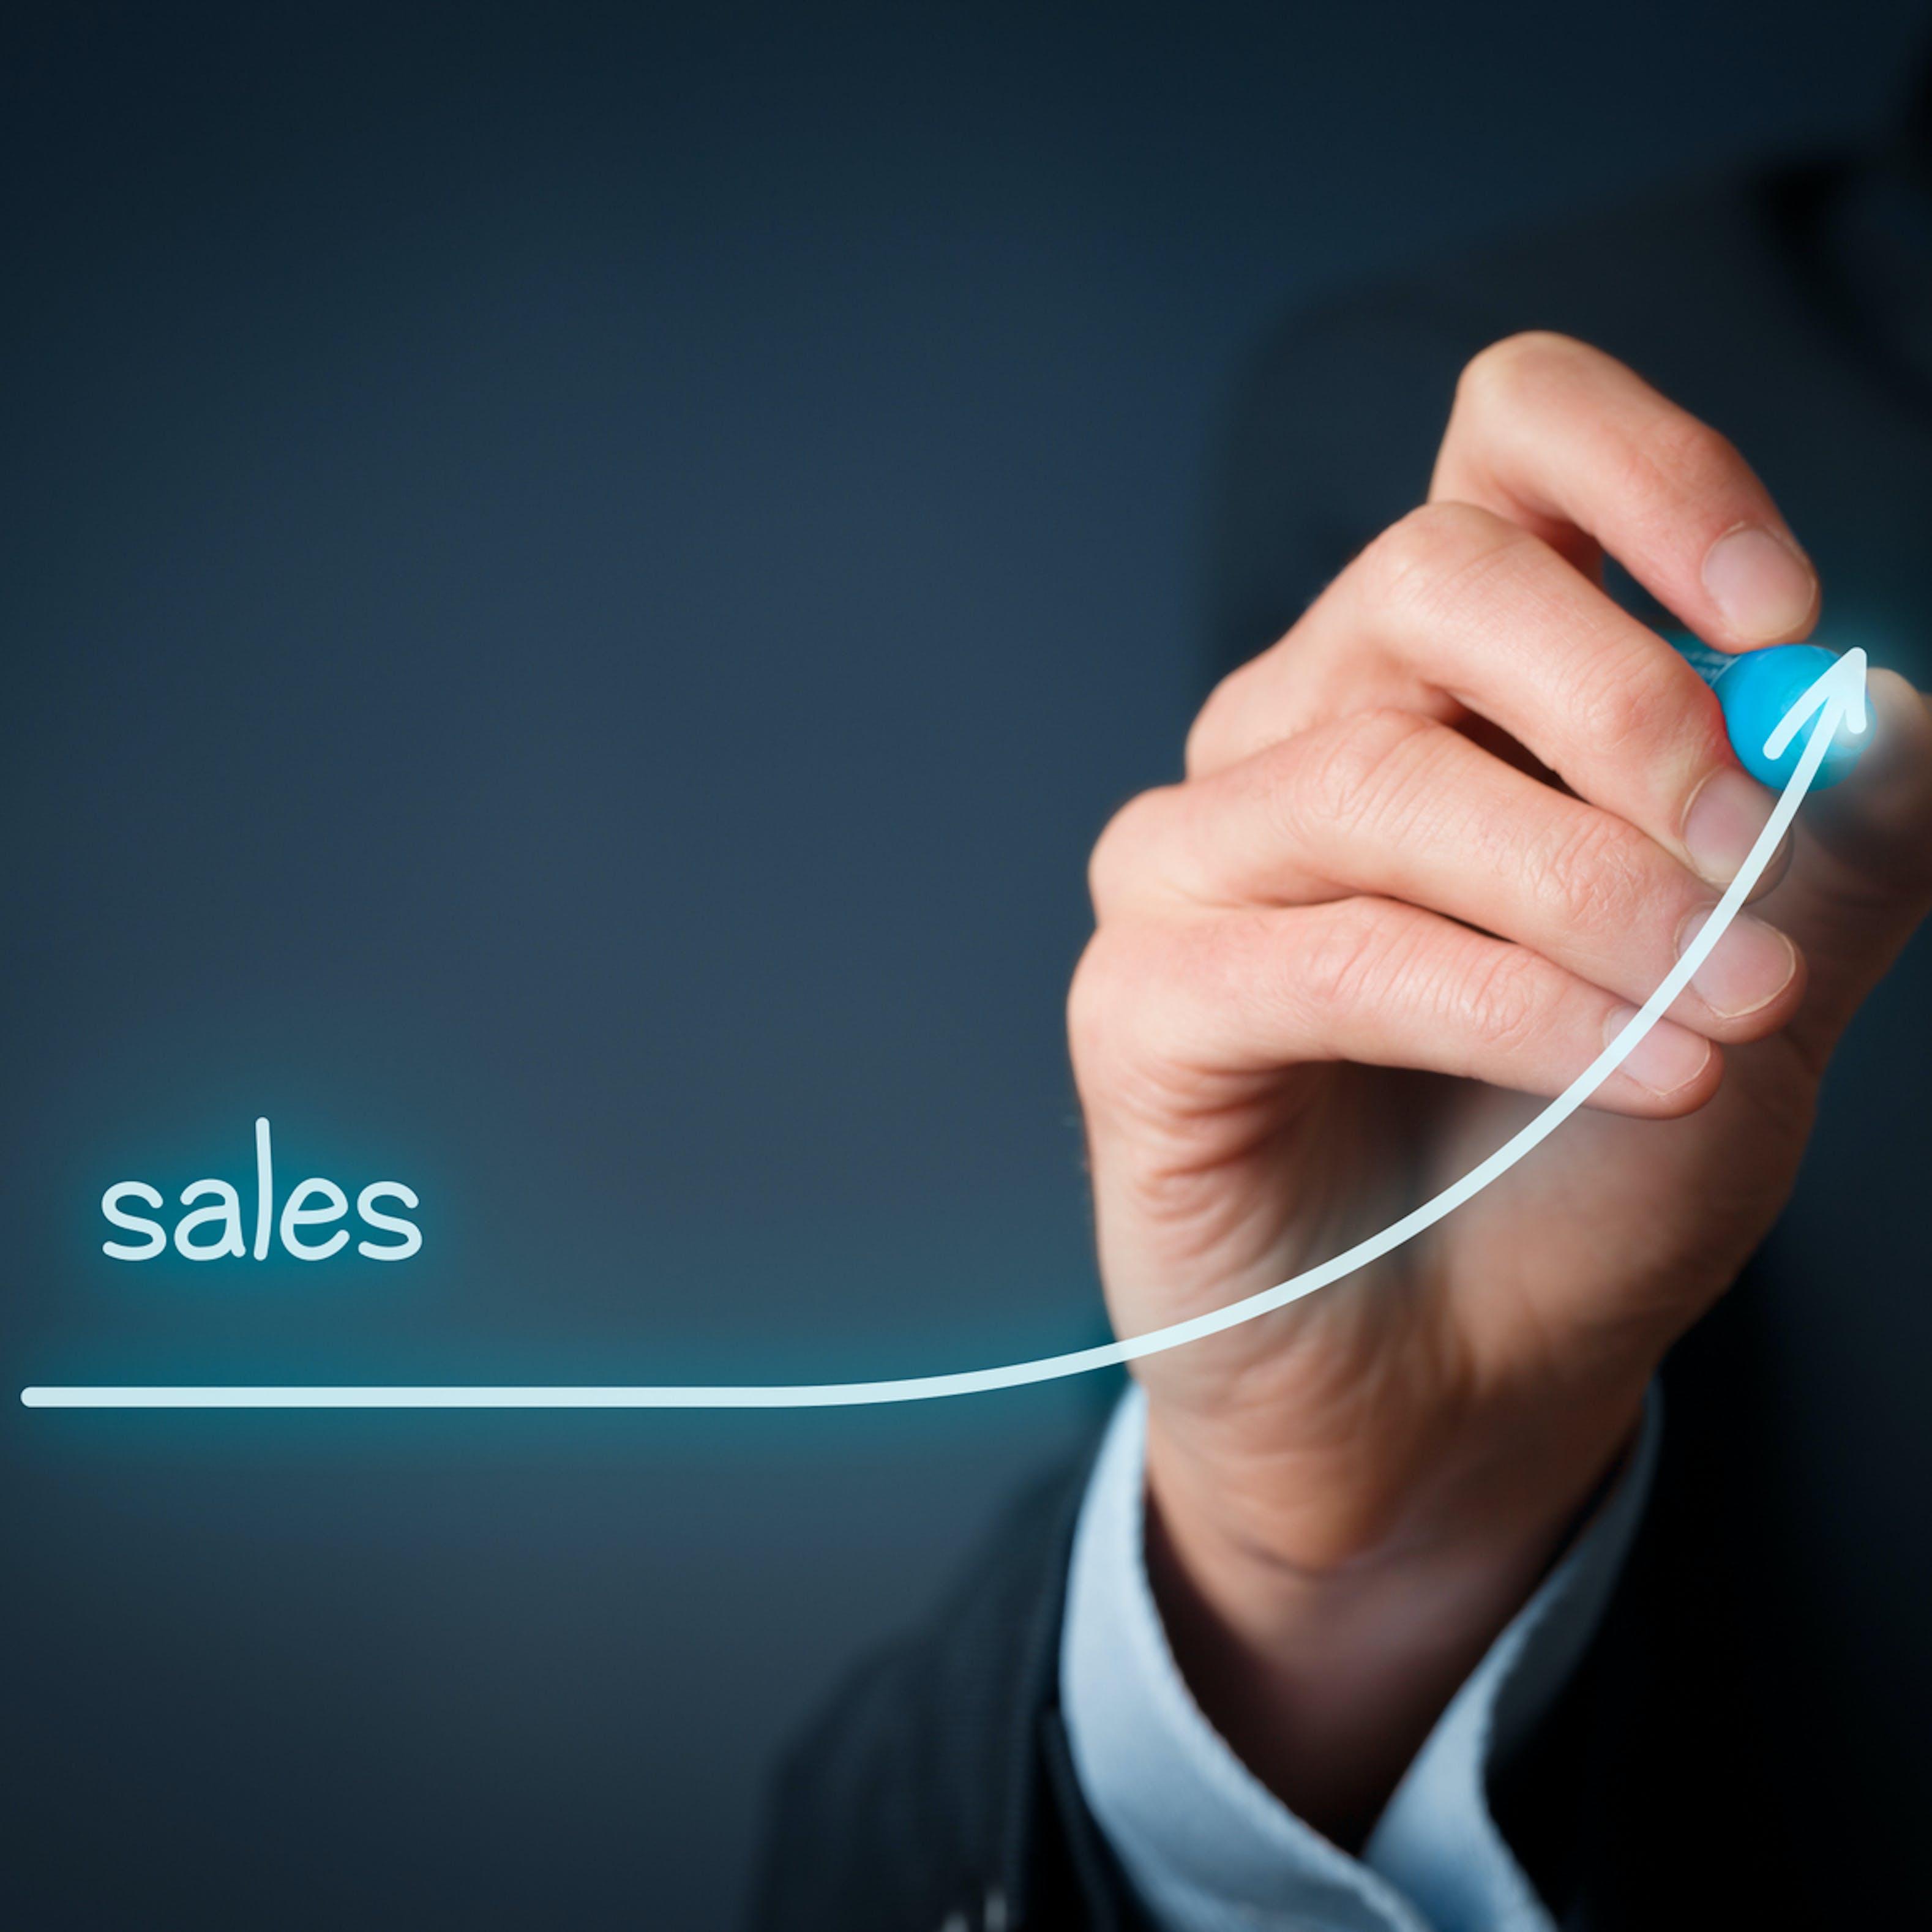 Strategic Sales Management Final Project   Coursera